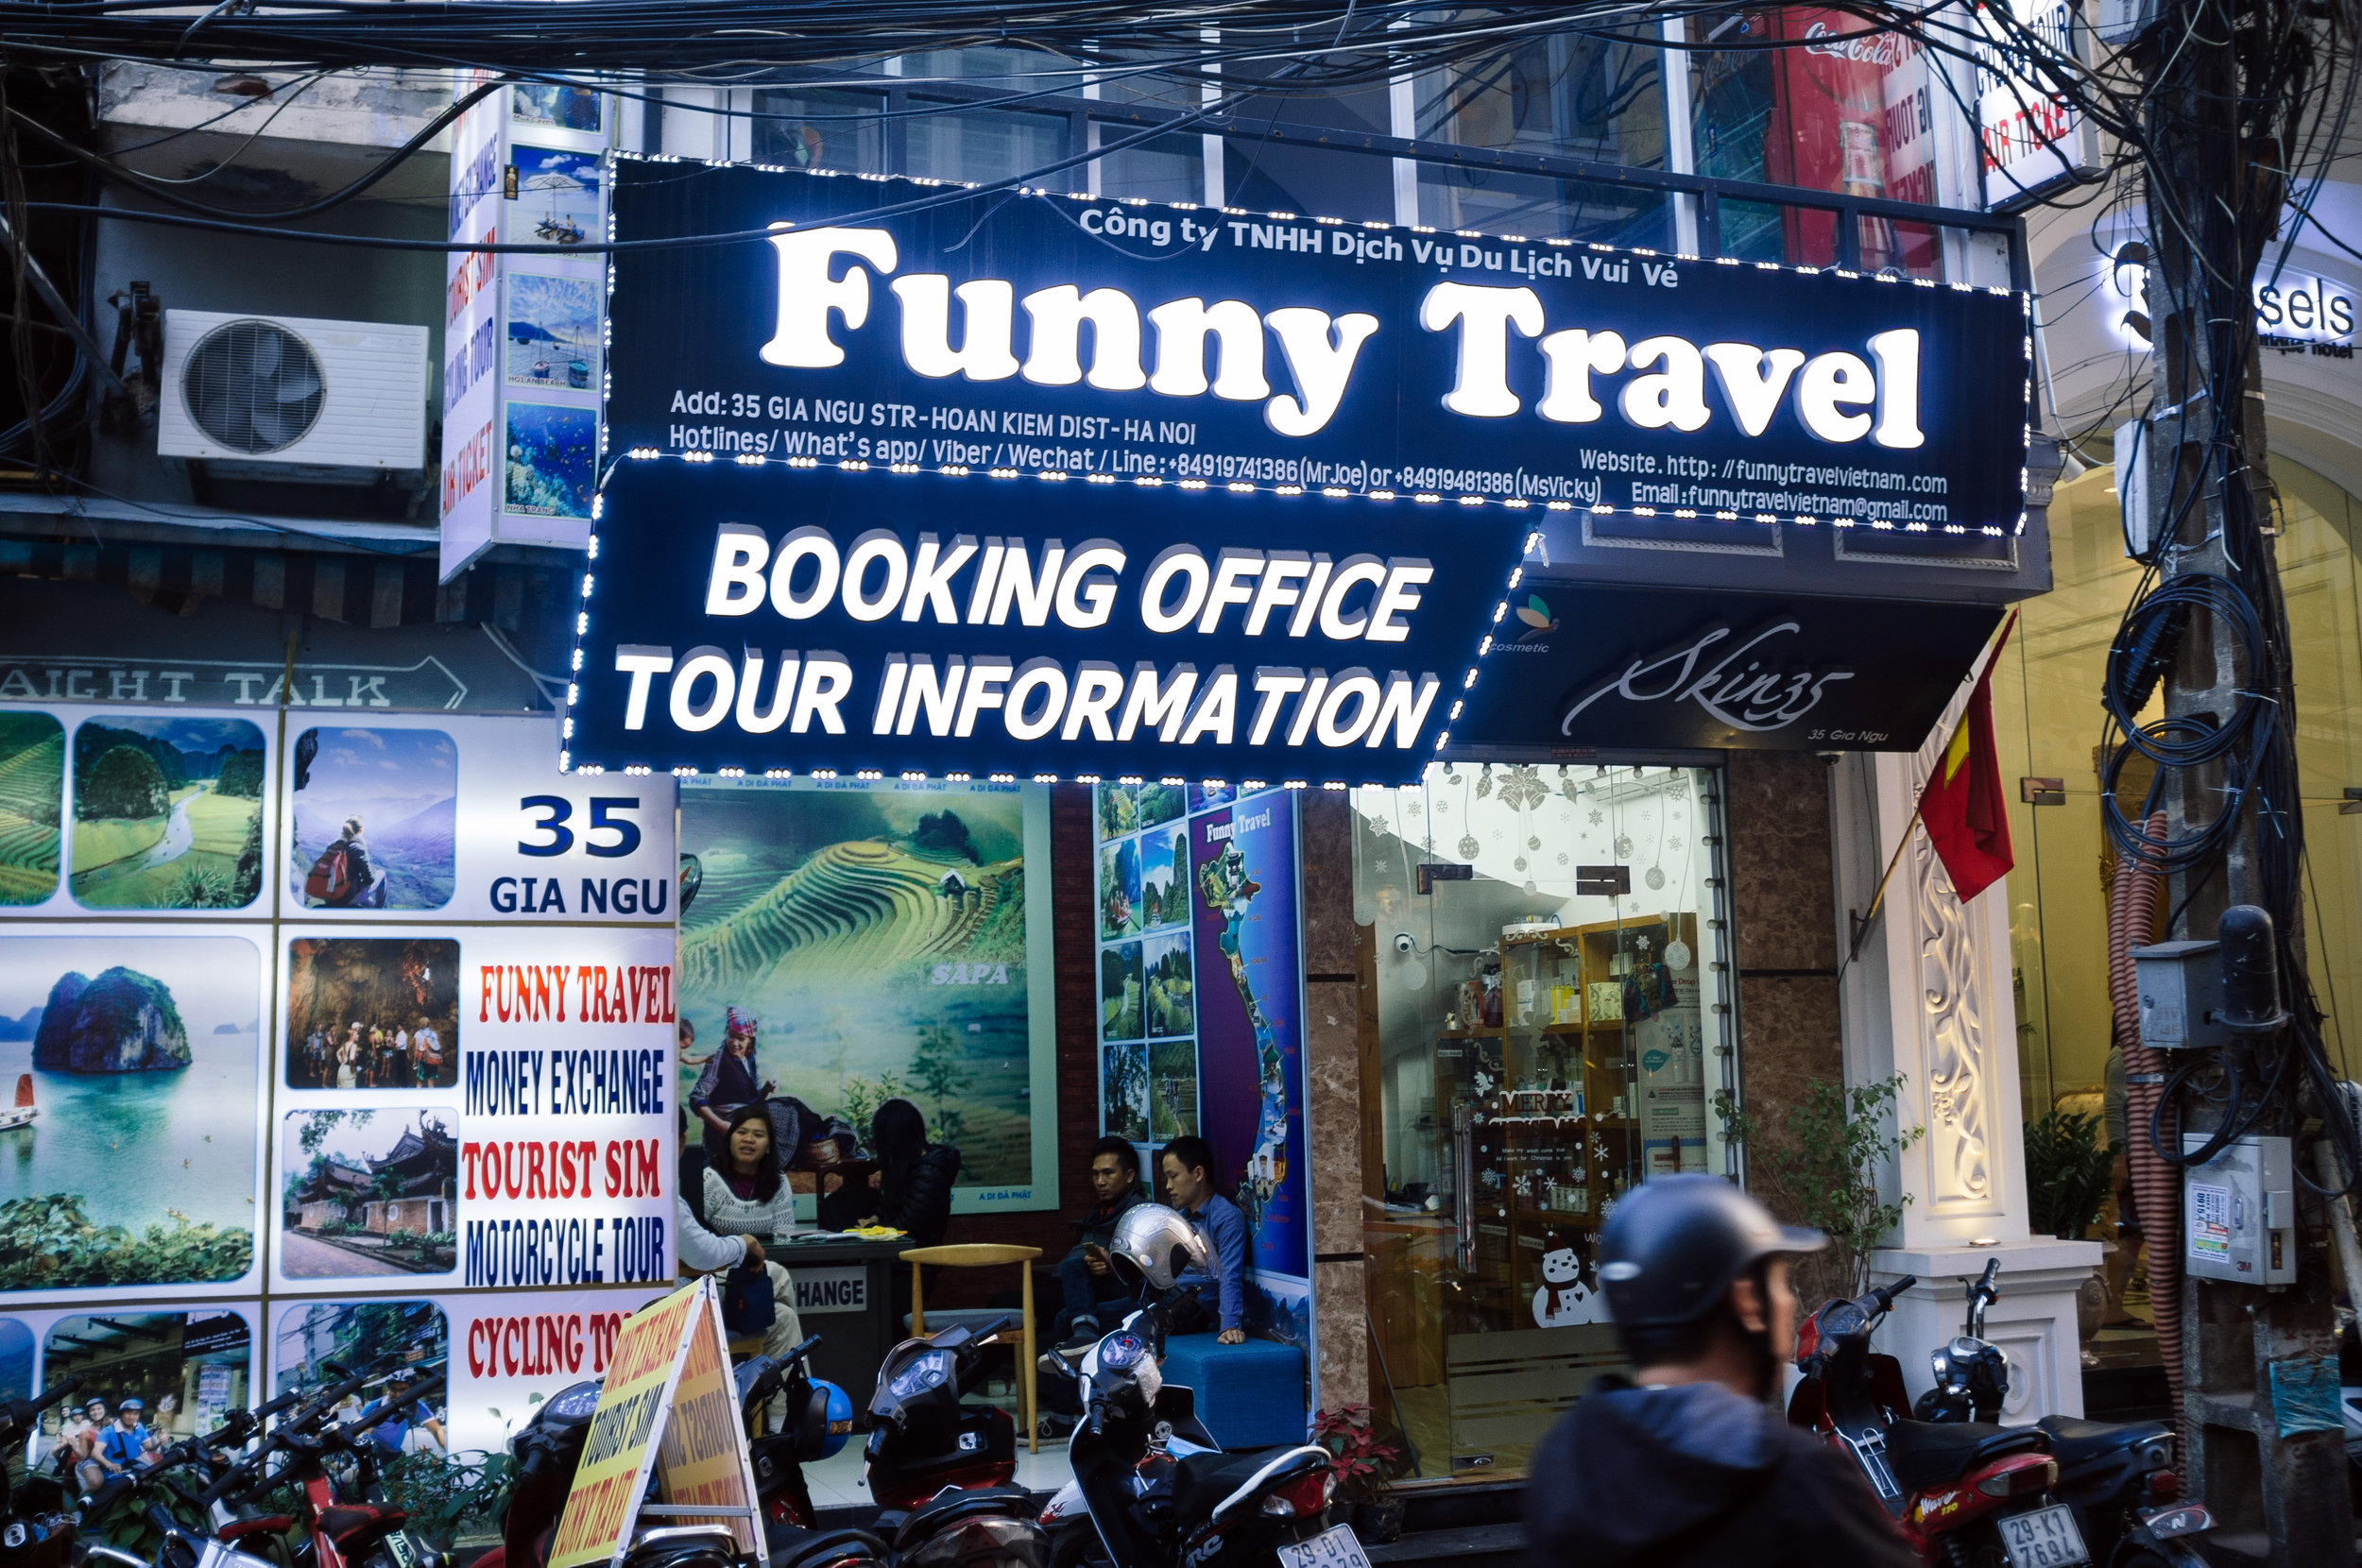 Funny Travel.jpg